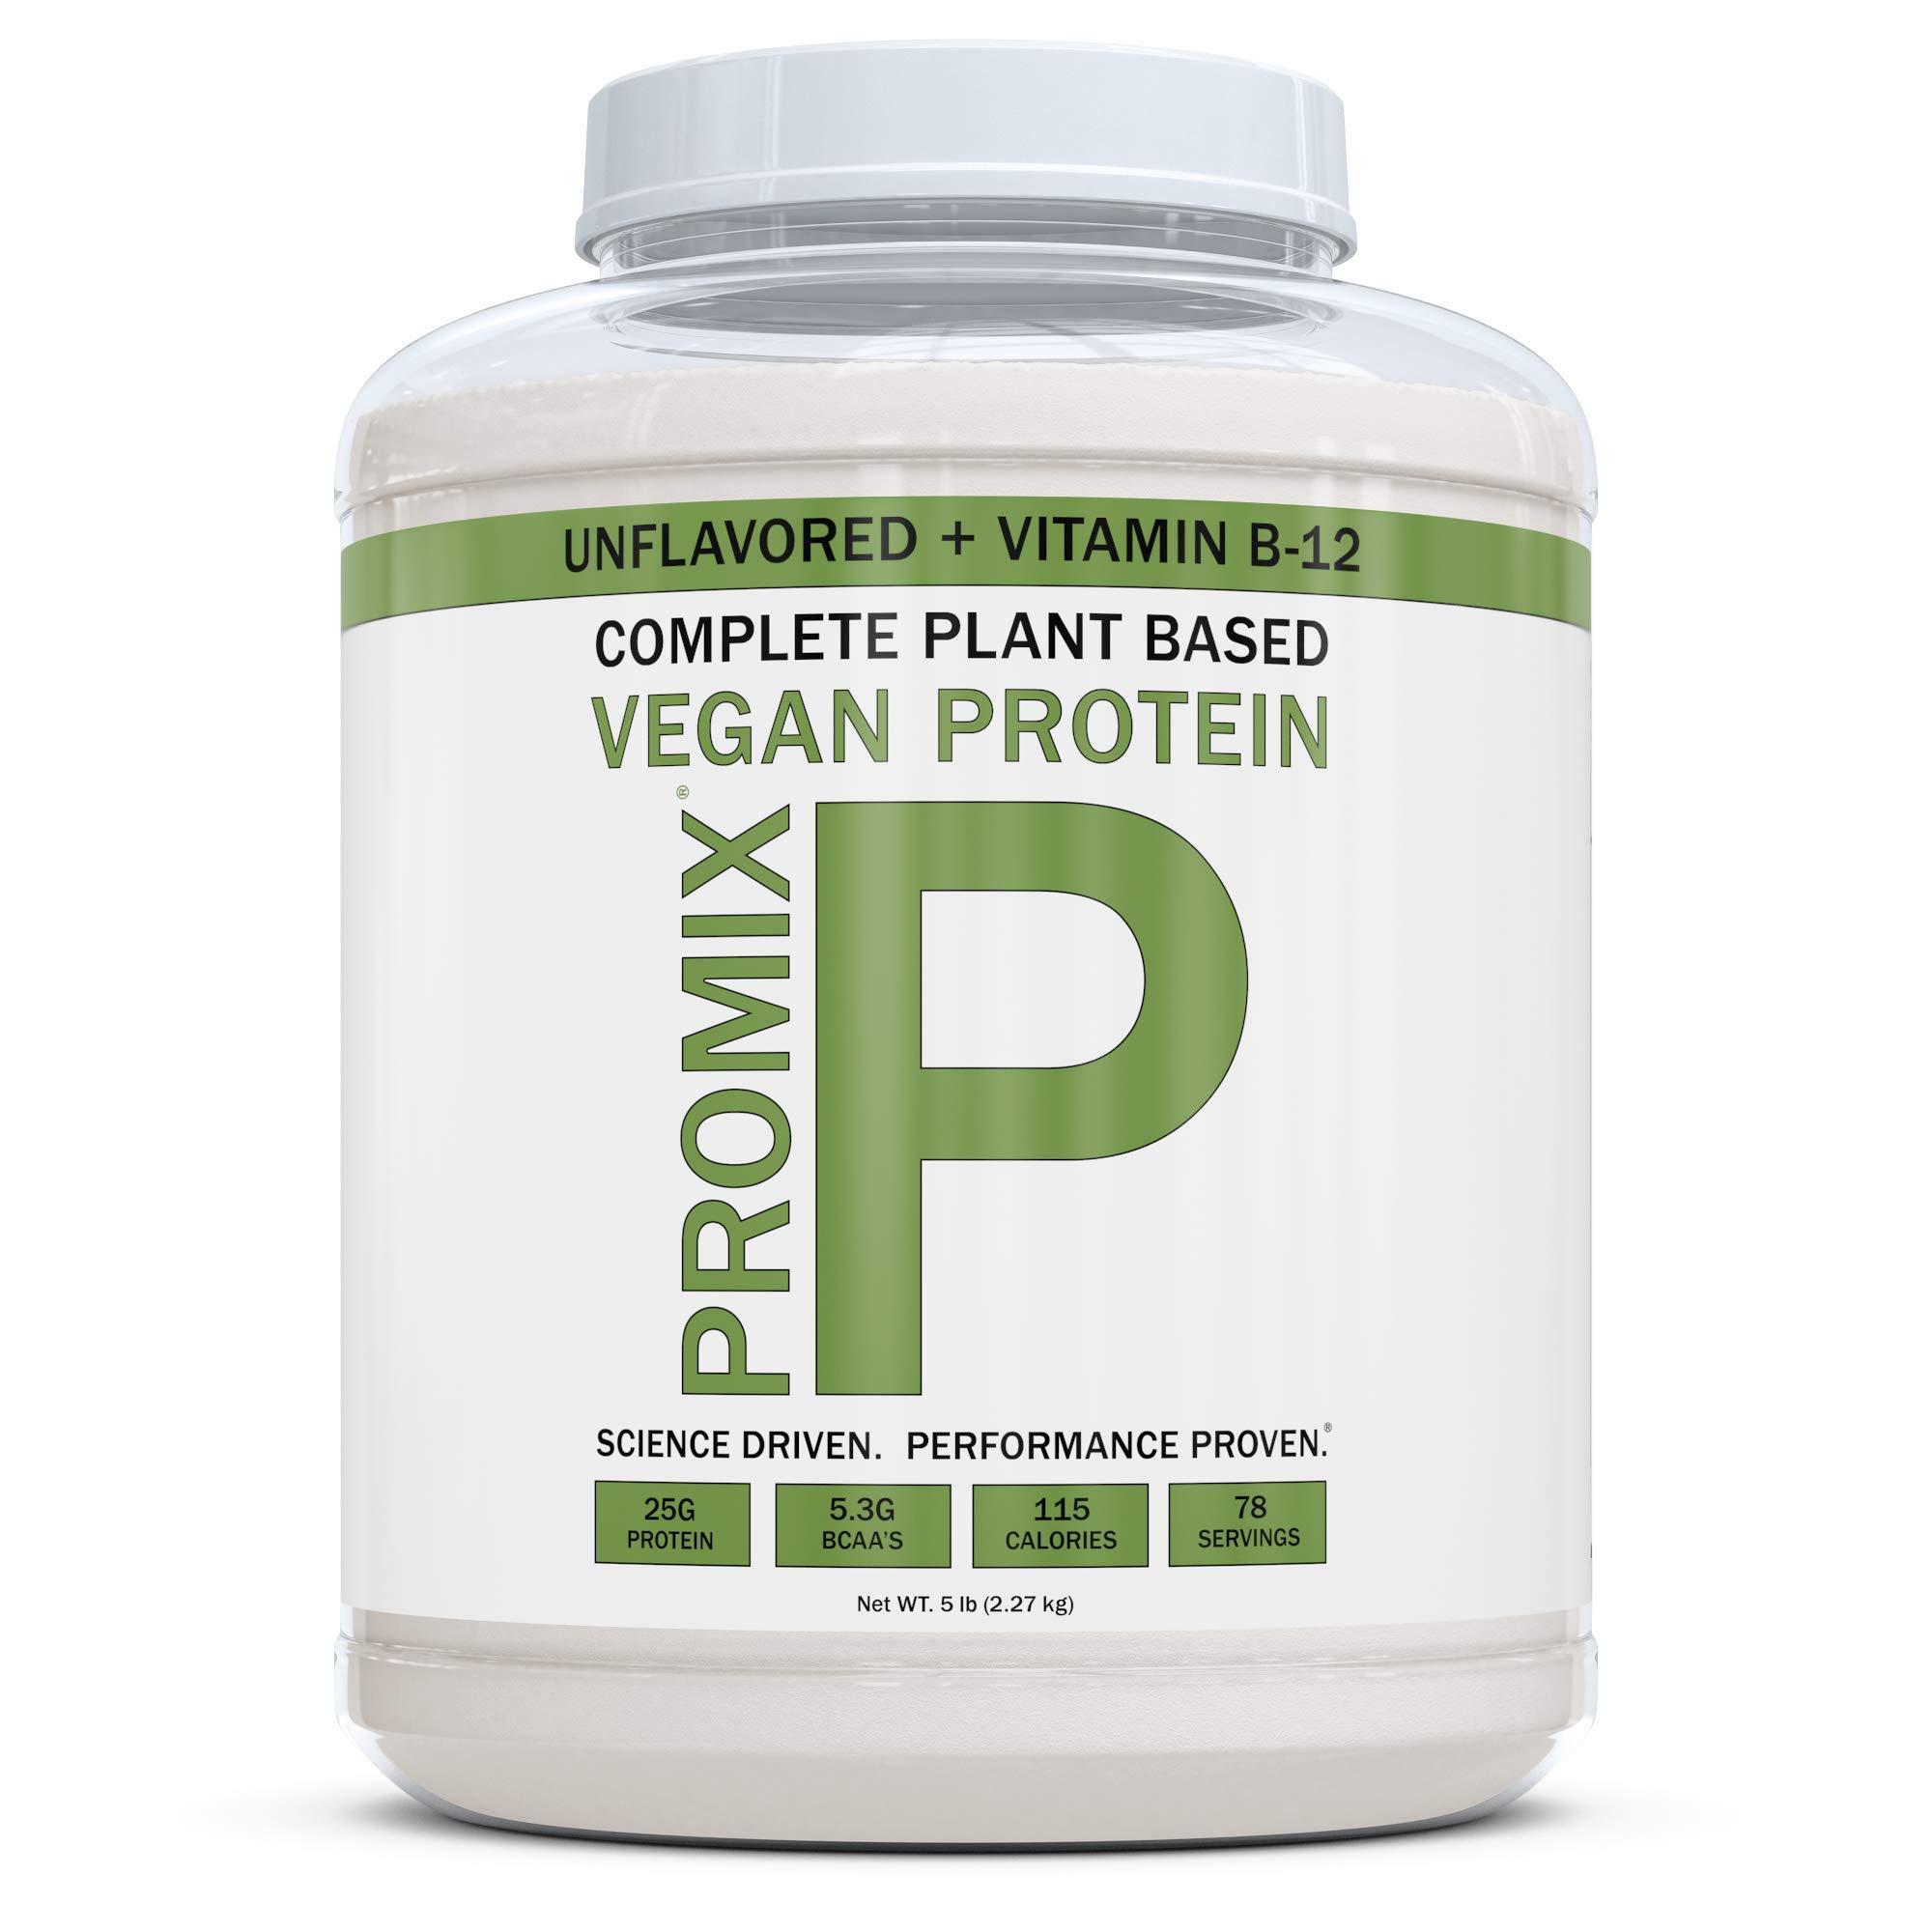 PROMIX Premium Vegan Protein + B12, Organic Complete Protein Plant Based Blend, Gluten-Free, Soy Free, 5lb Bulk